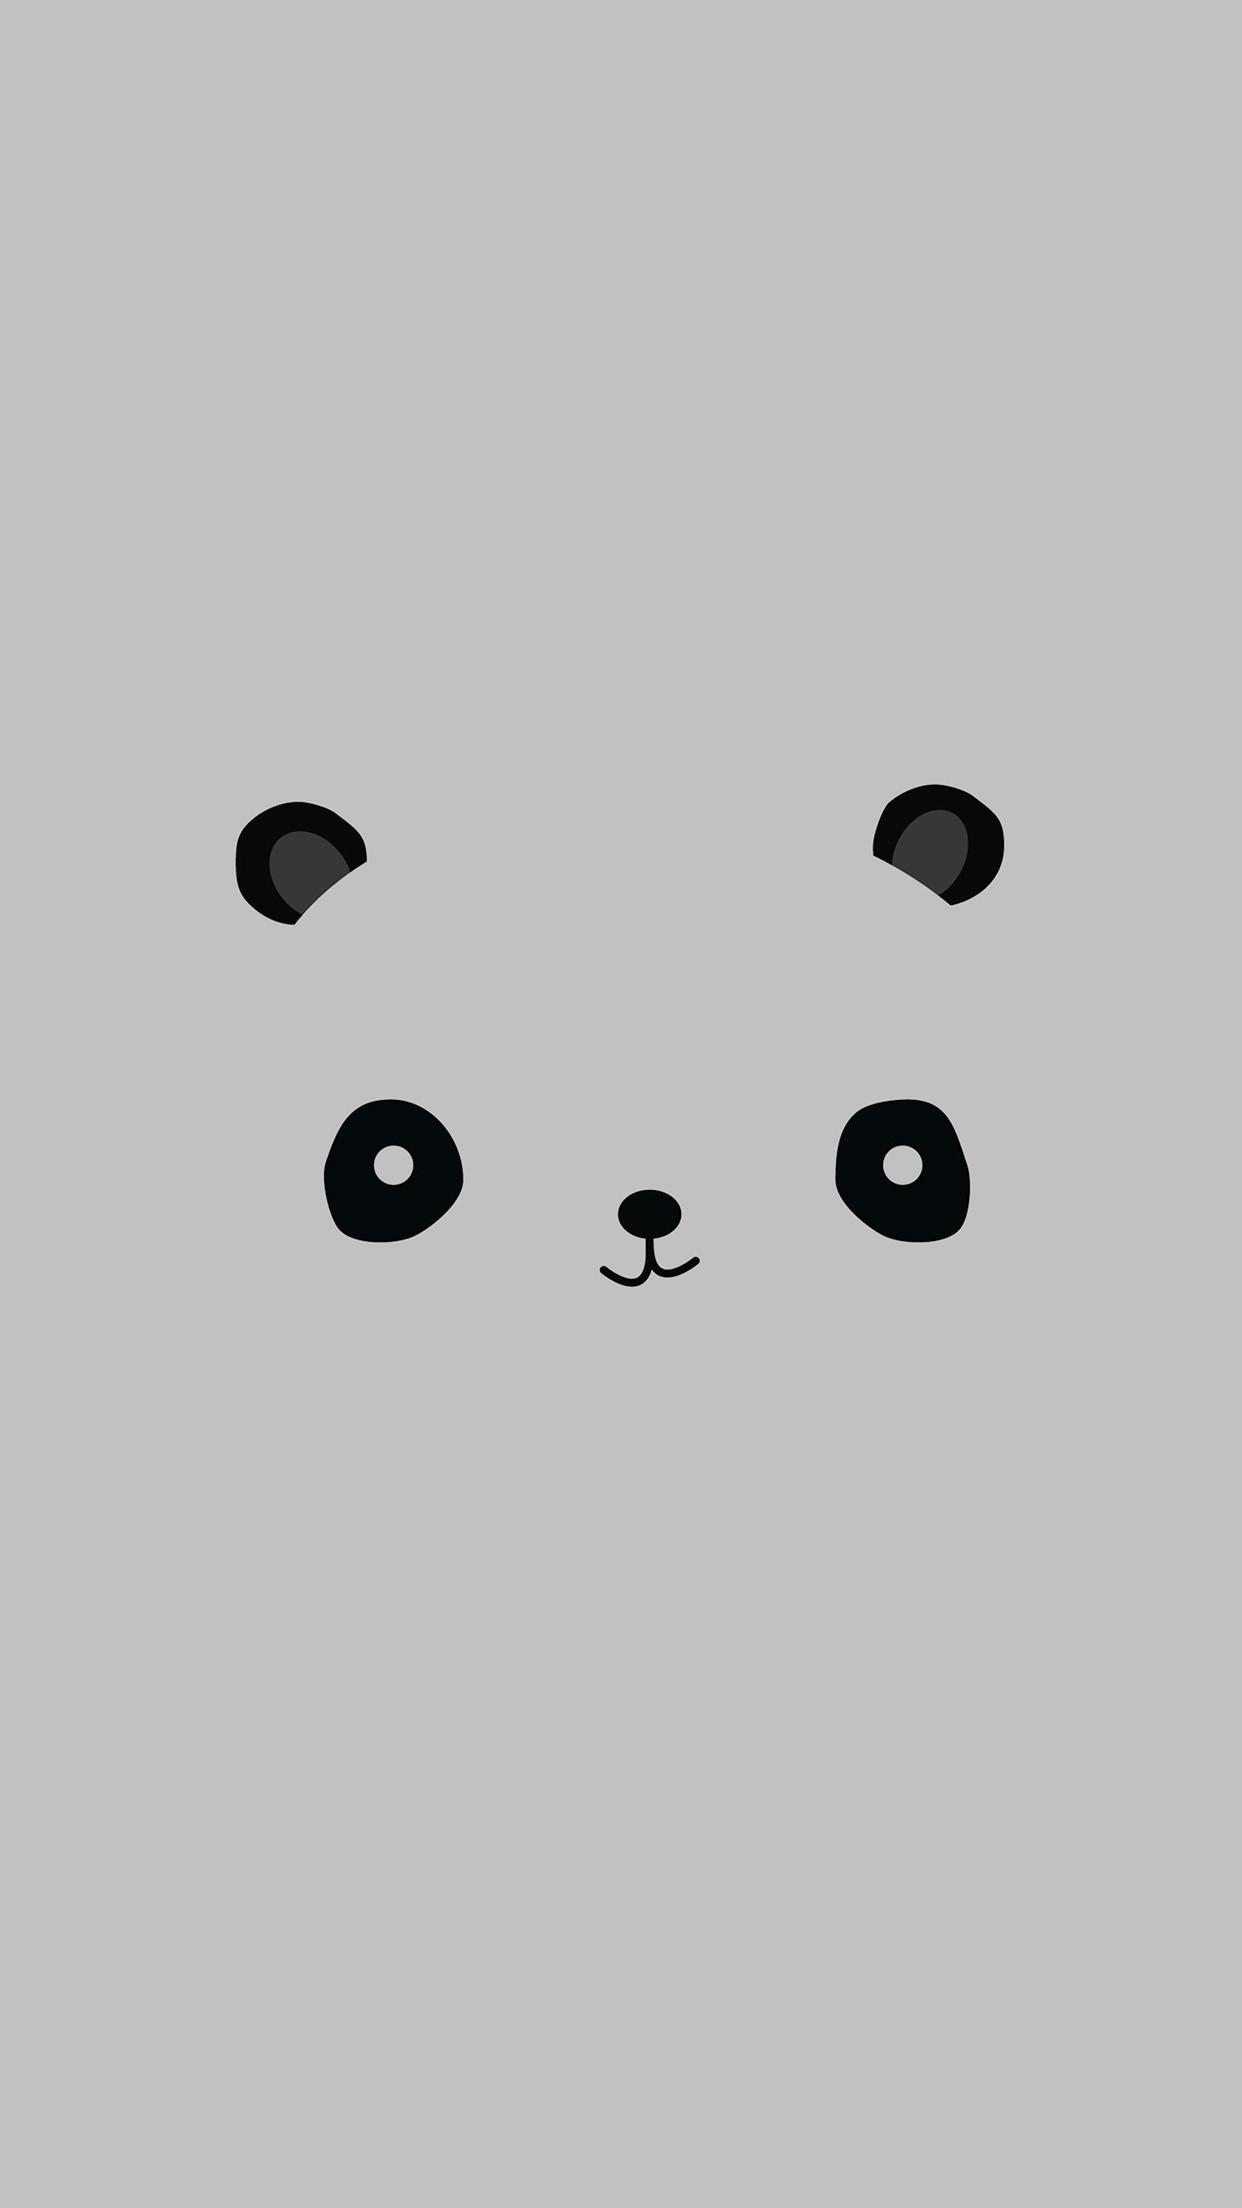 Cute Minimal Panda Android Wallpaper free download